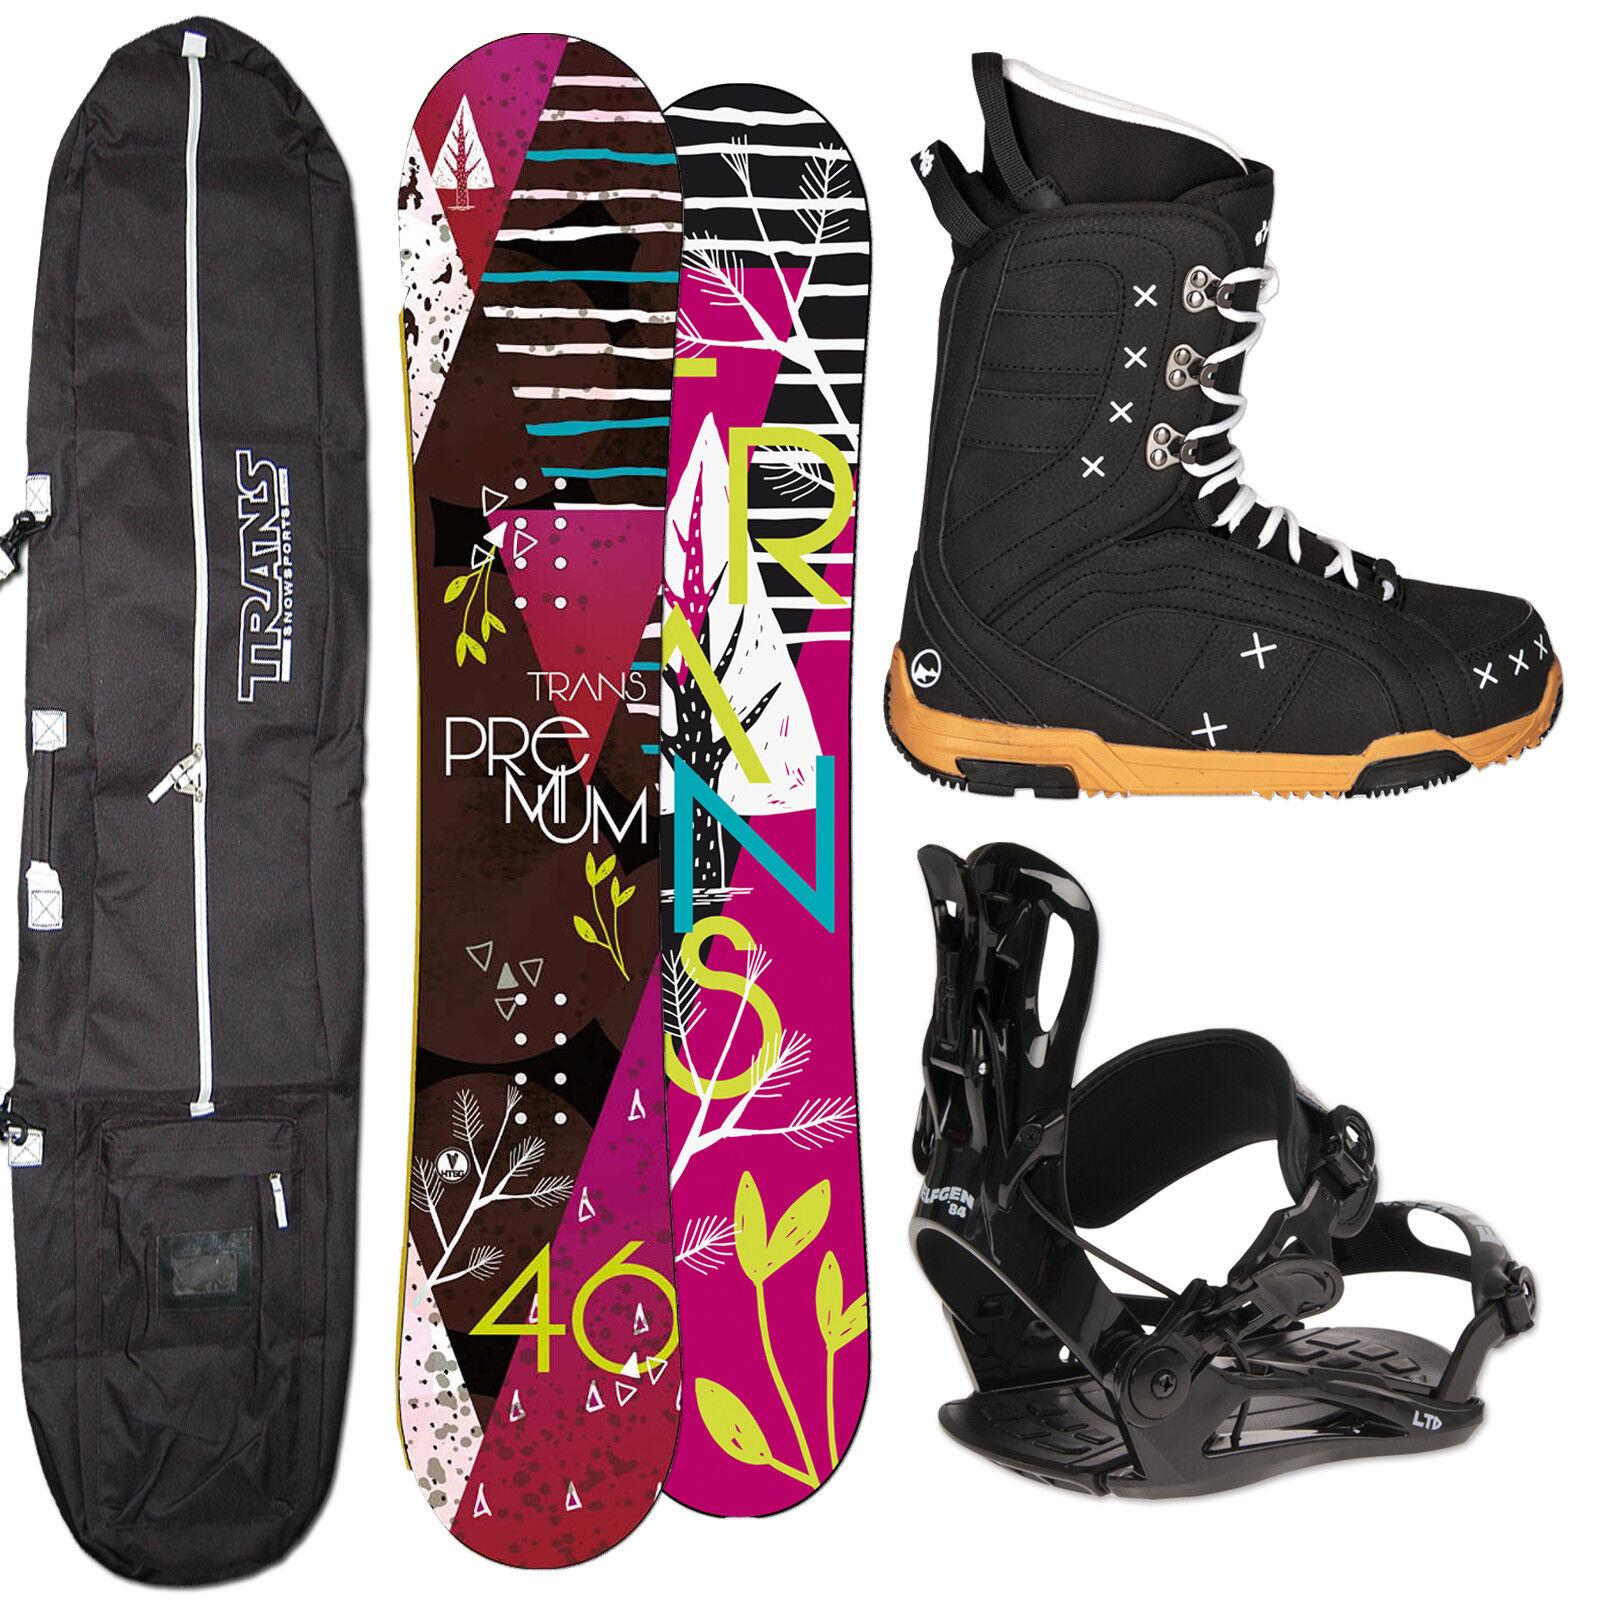 Women's Snowboard Trans Premium 148 cm + Fastec Binding Size M + Boots+ Bag